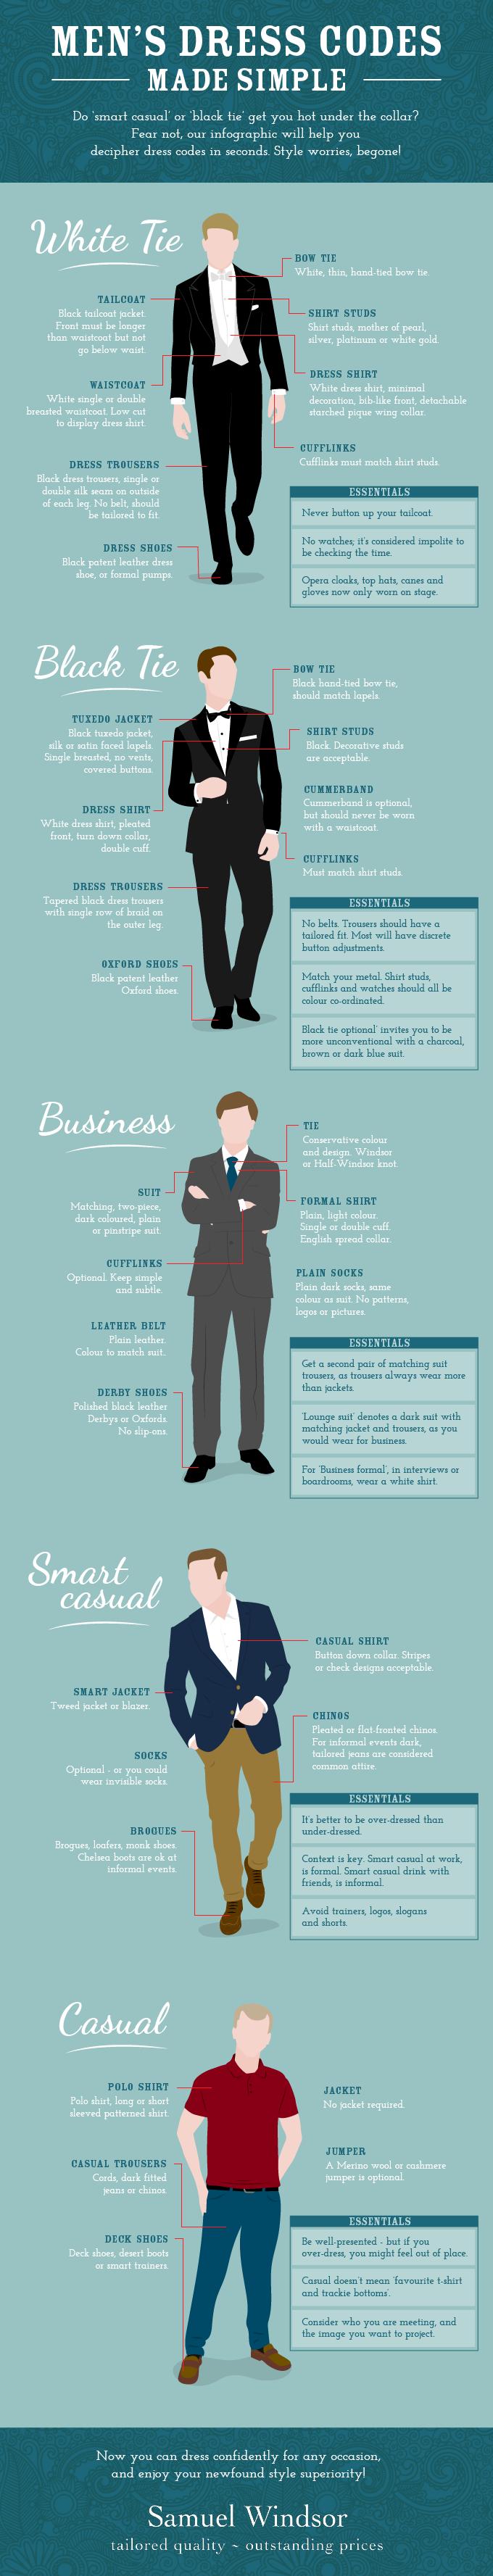 mens-dress-code-infographic